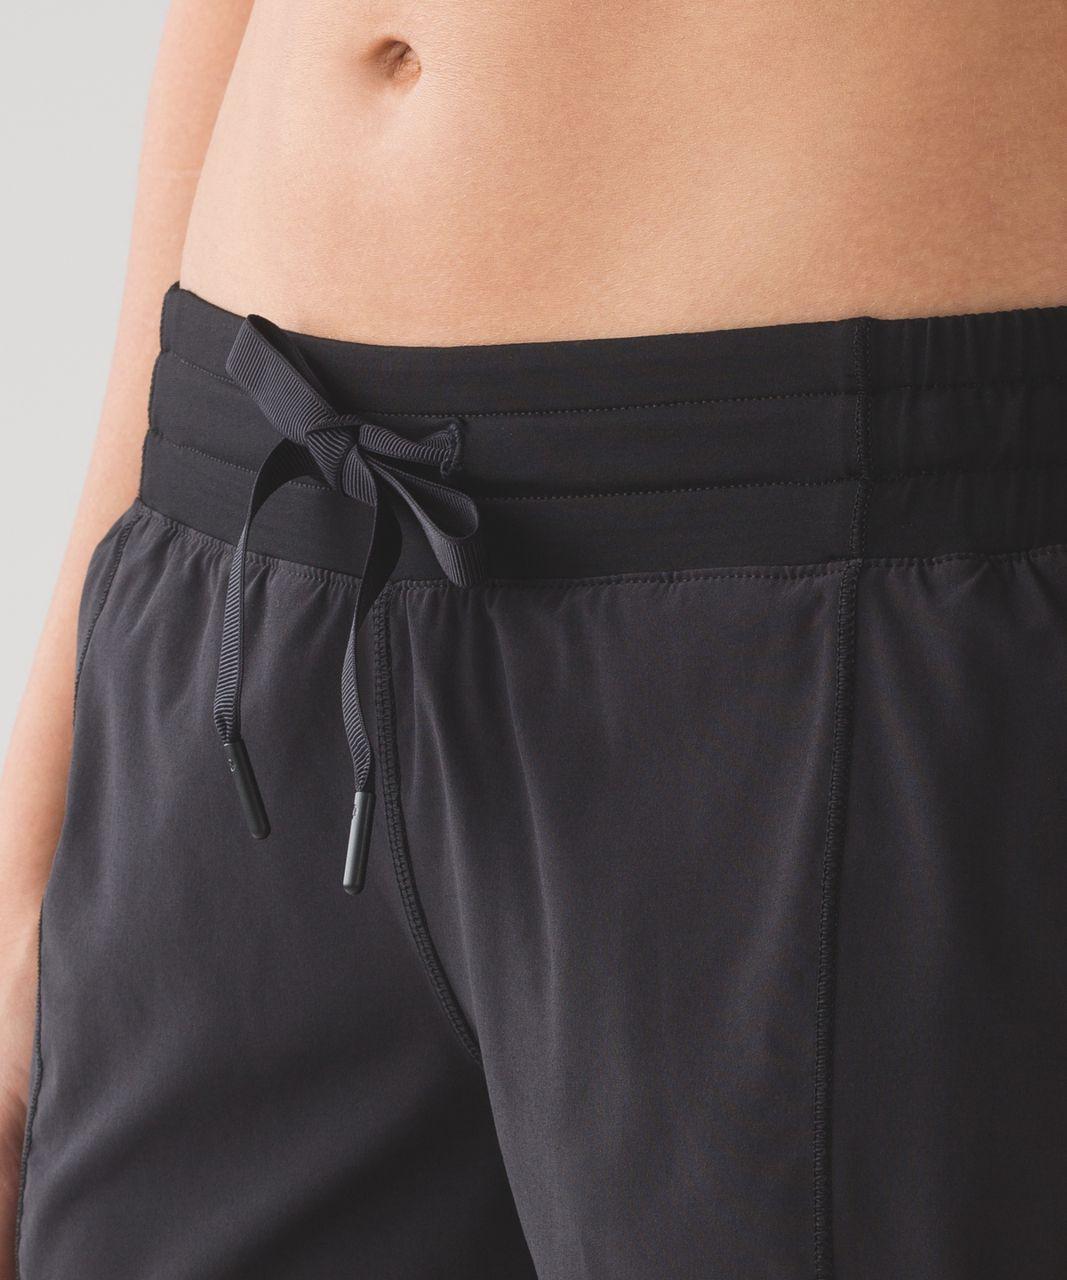 "Lululemon Hotty Hot Short (Long 4"") - Black"